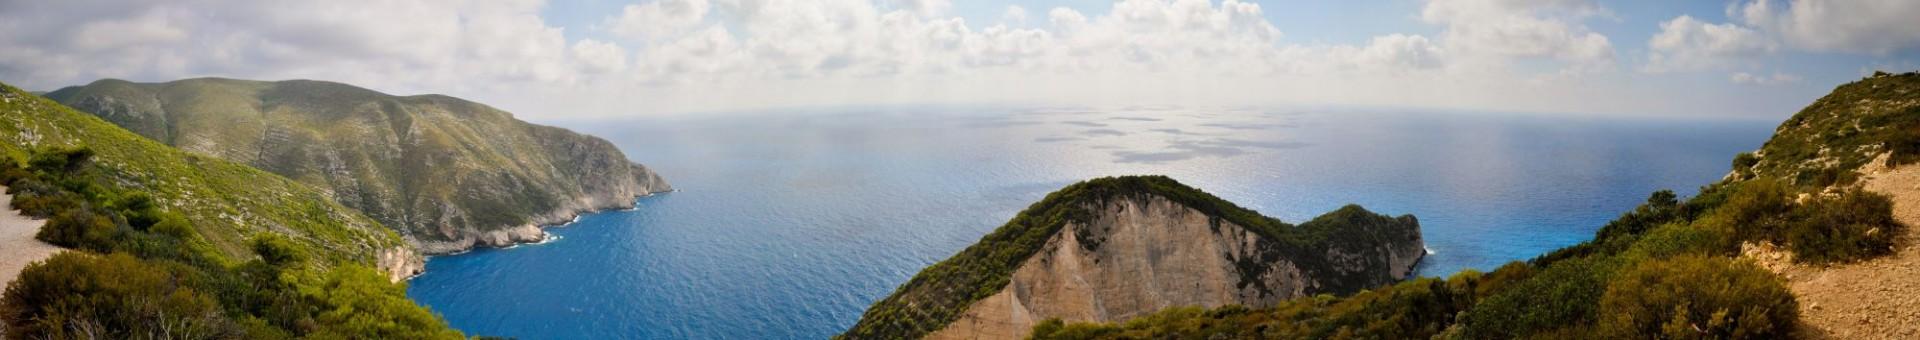 Greece | Zakynthos